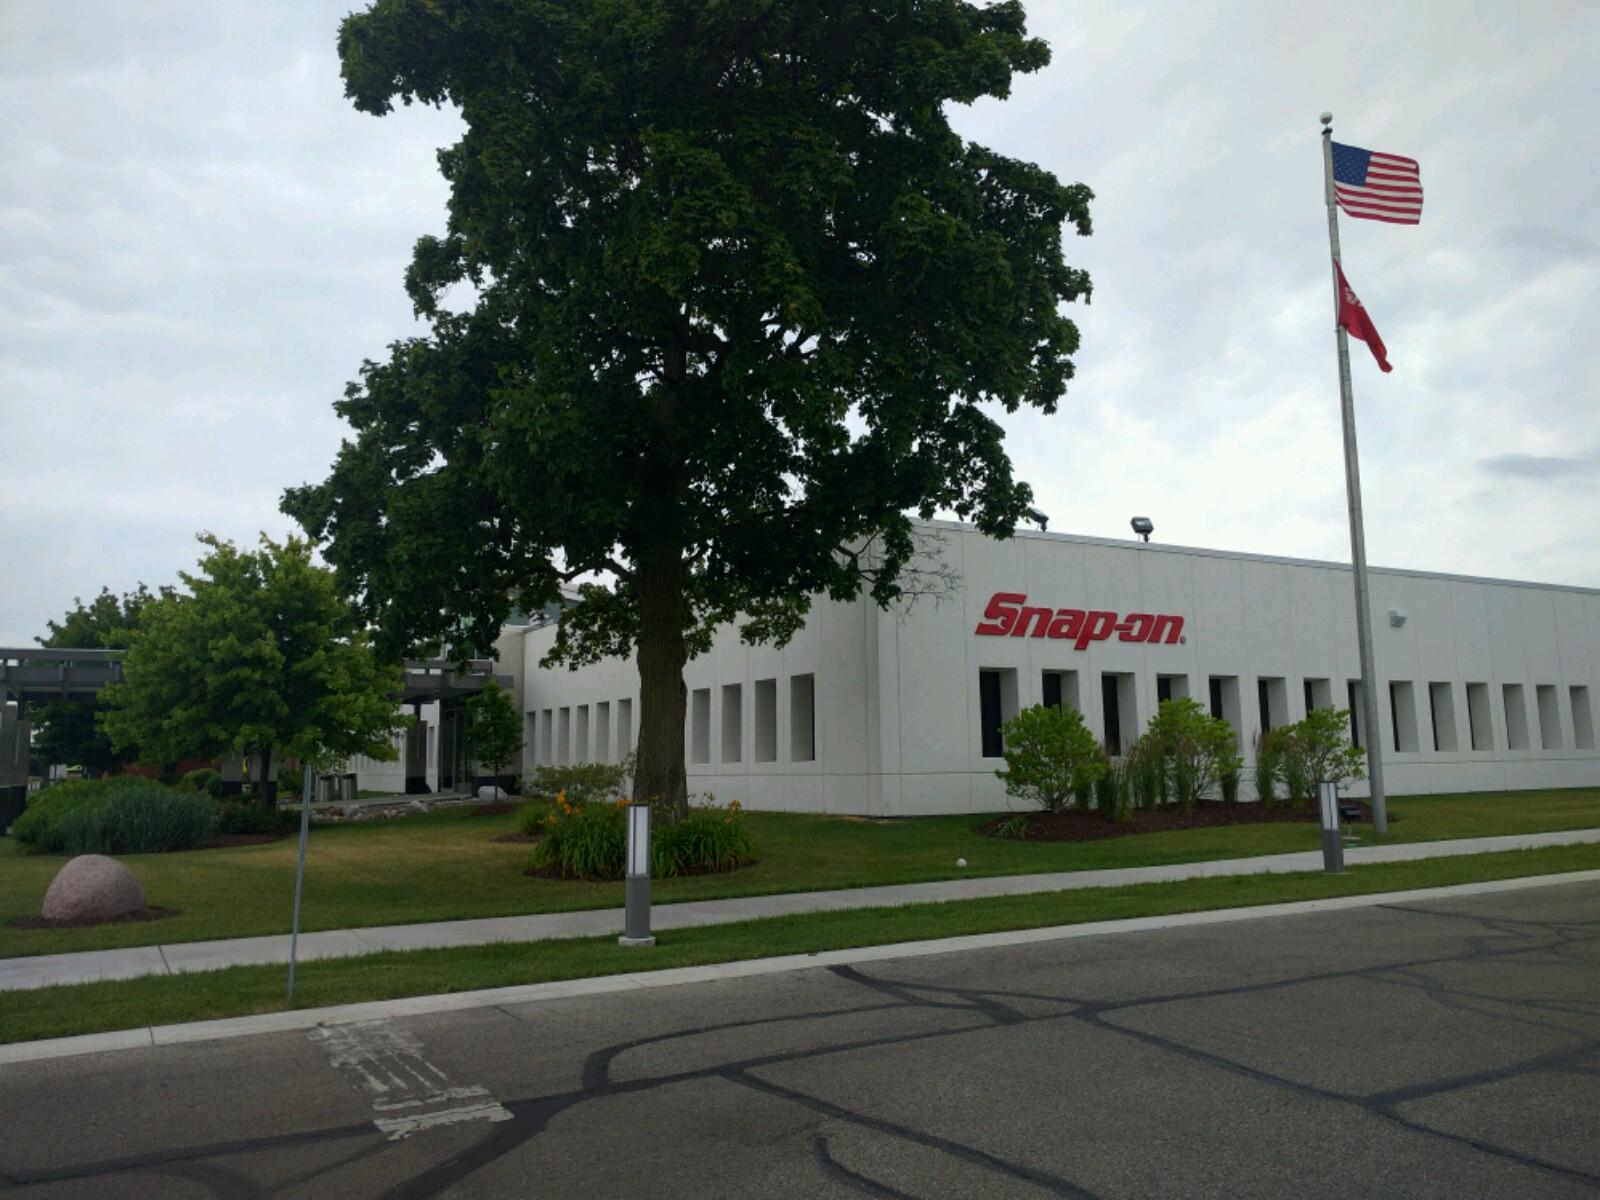 Snap-on's corporate headquarters in Kenosha, Wisconsin.